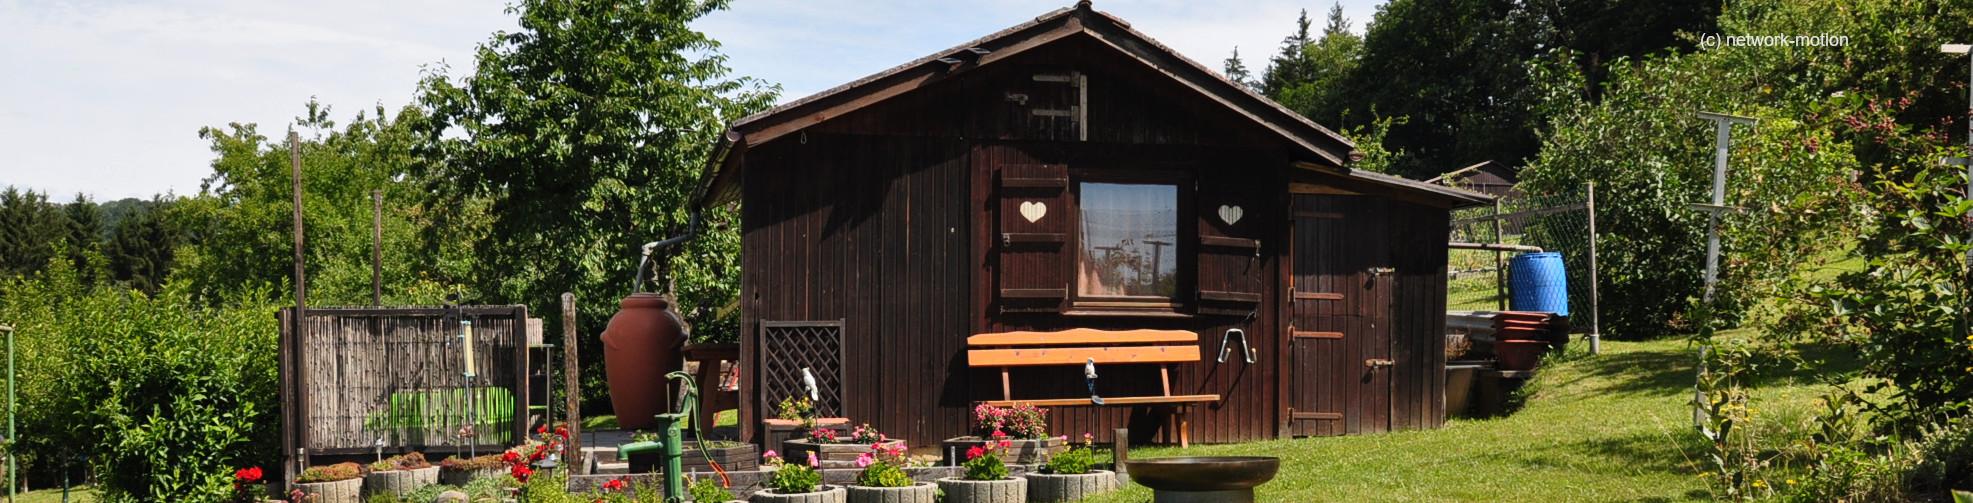 Vereinsdaten der Gartenfreunde Illingen e.V.